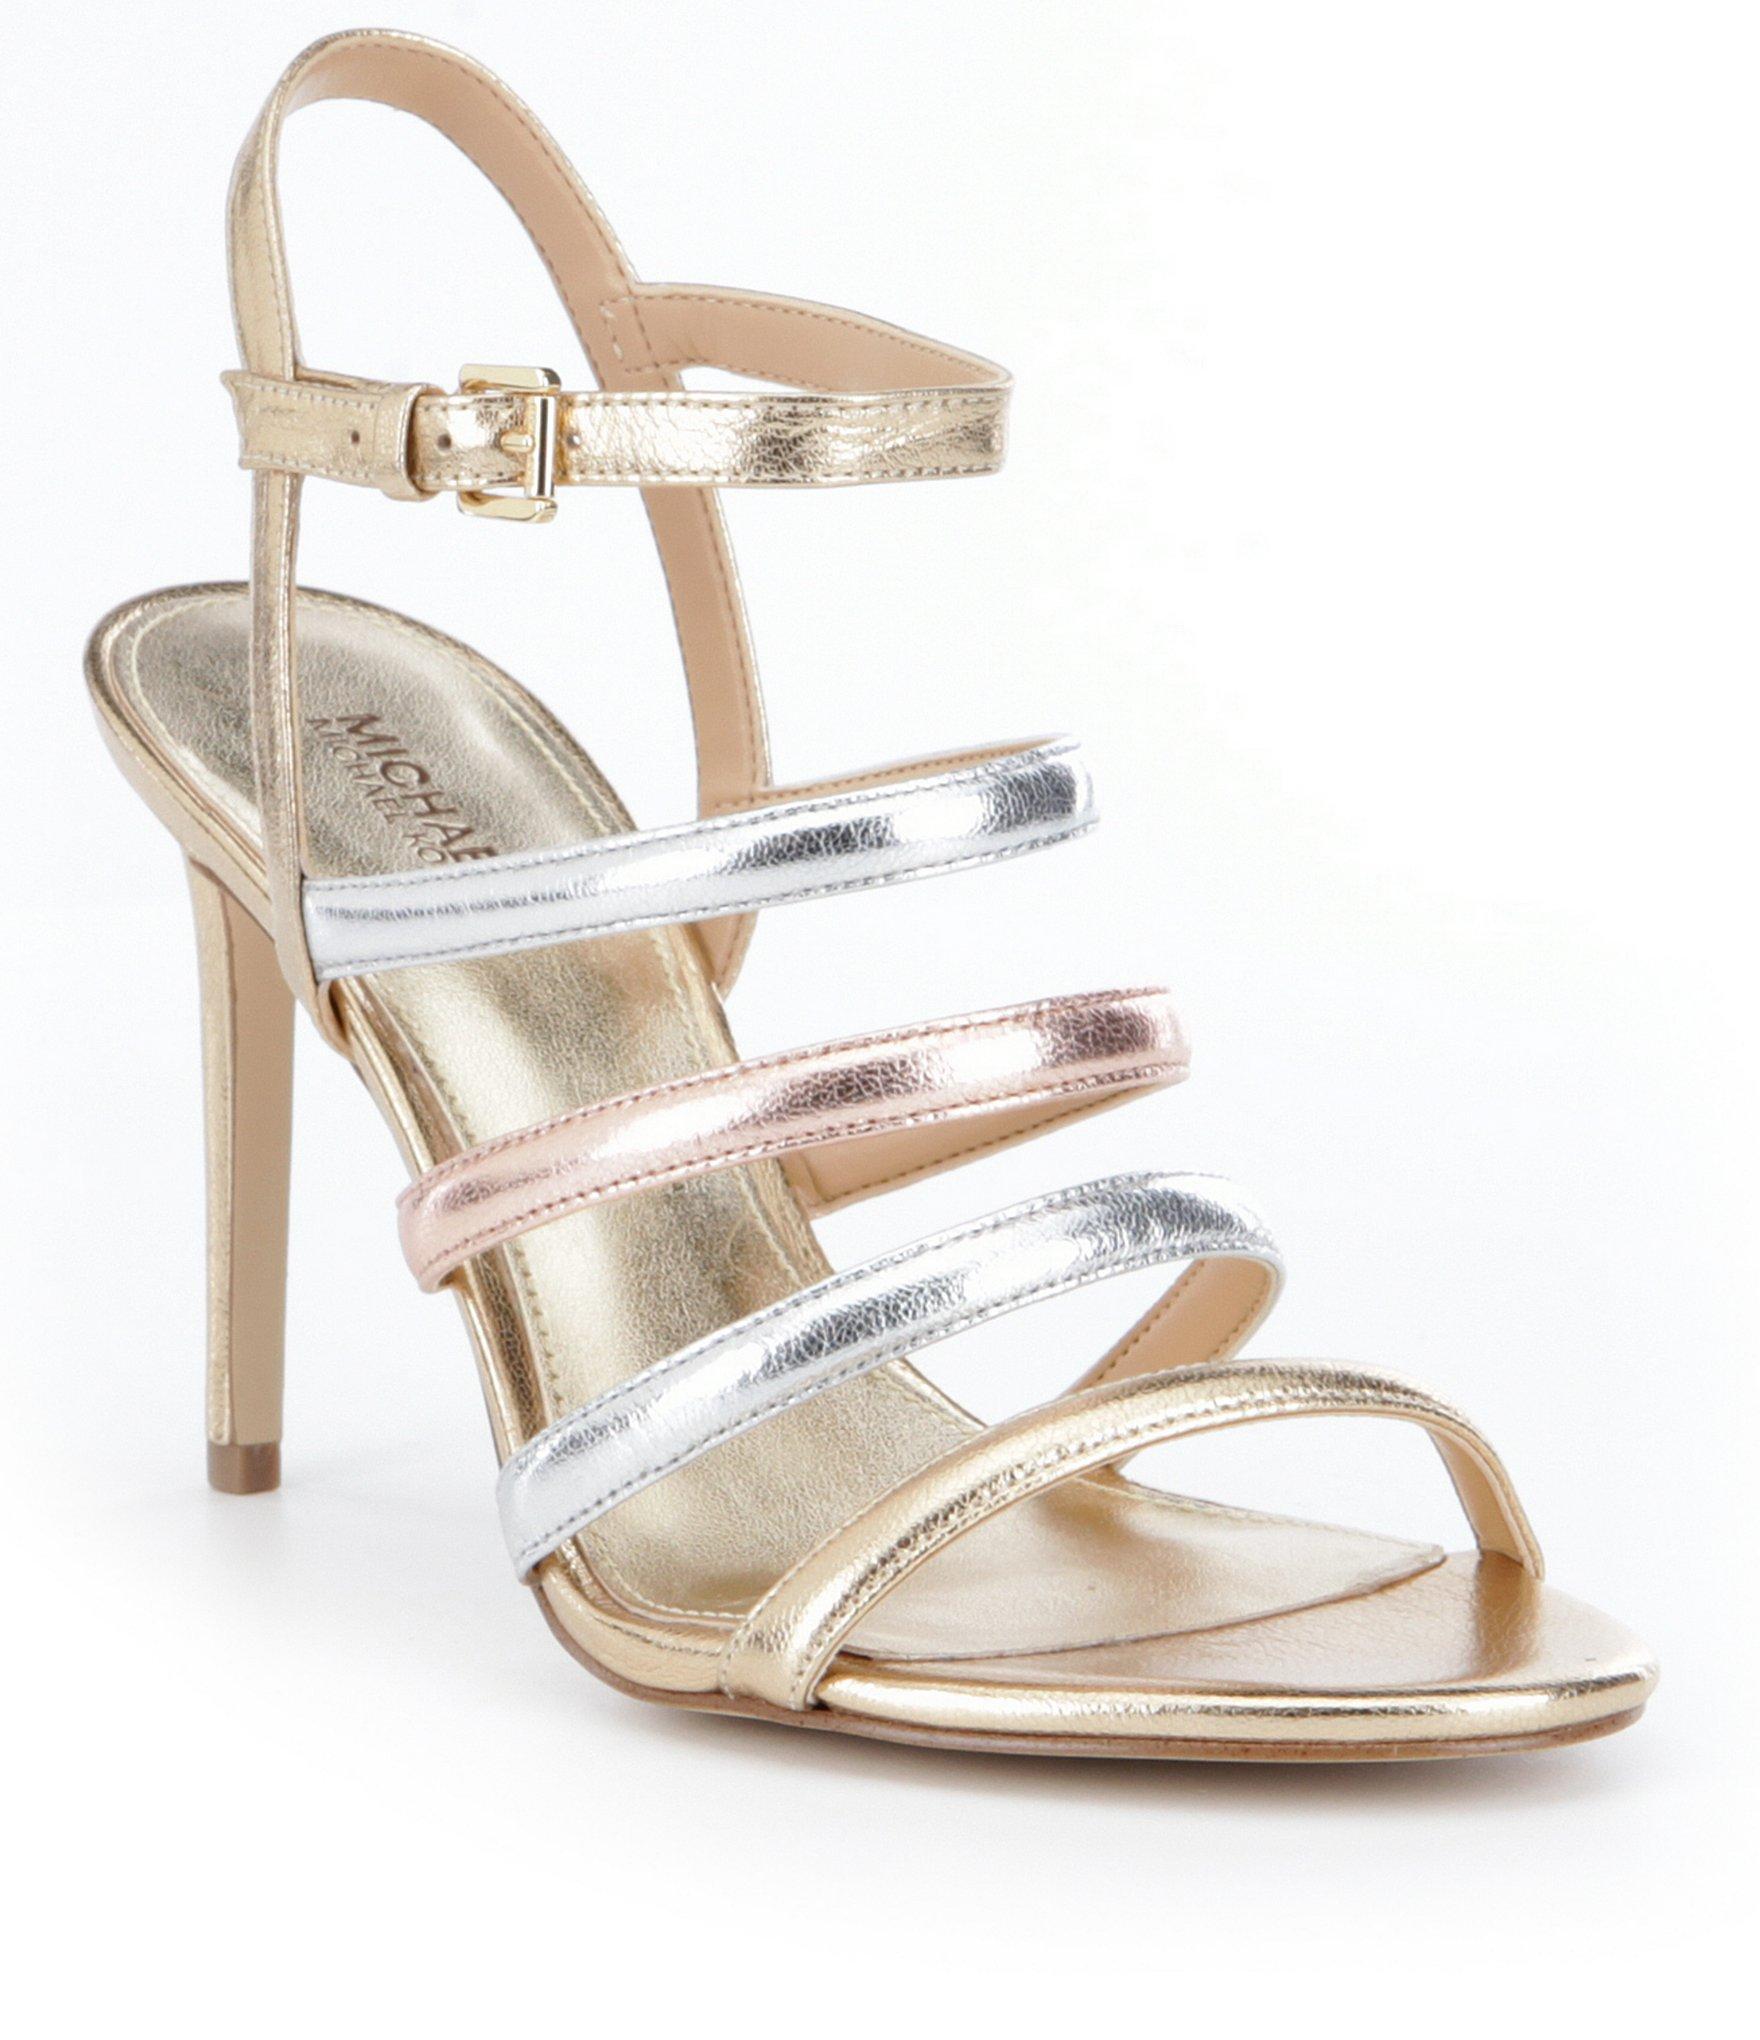 e1ed078646a Lyst - MICHAEL Michael Kors Nantucket Sandals in Metallic